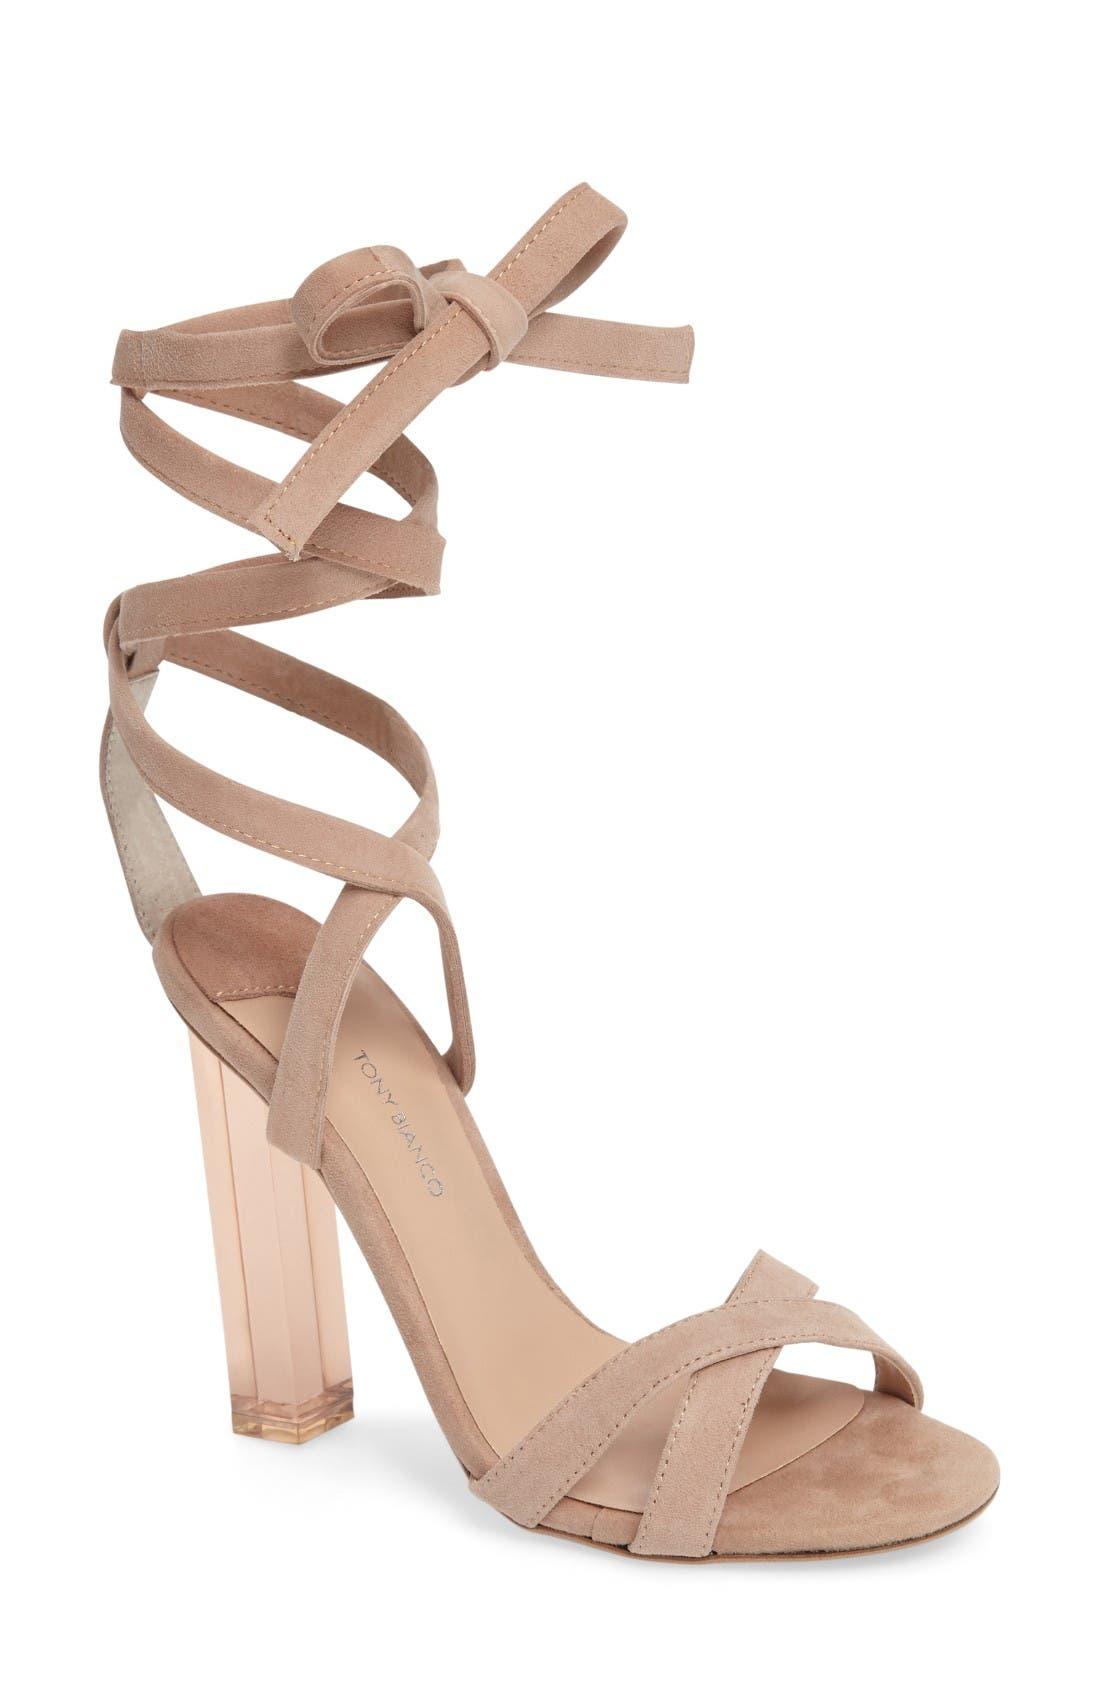 Alternate Image 1 Selected - Tony Bianco Komma Translucent Heel Sandal (Women)